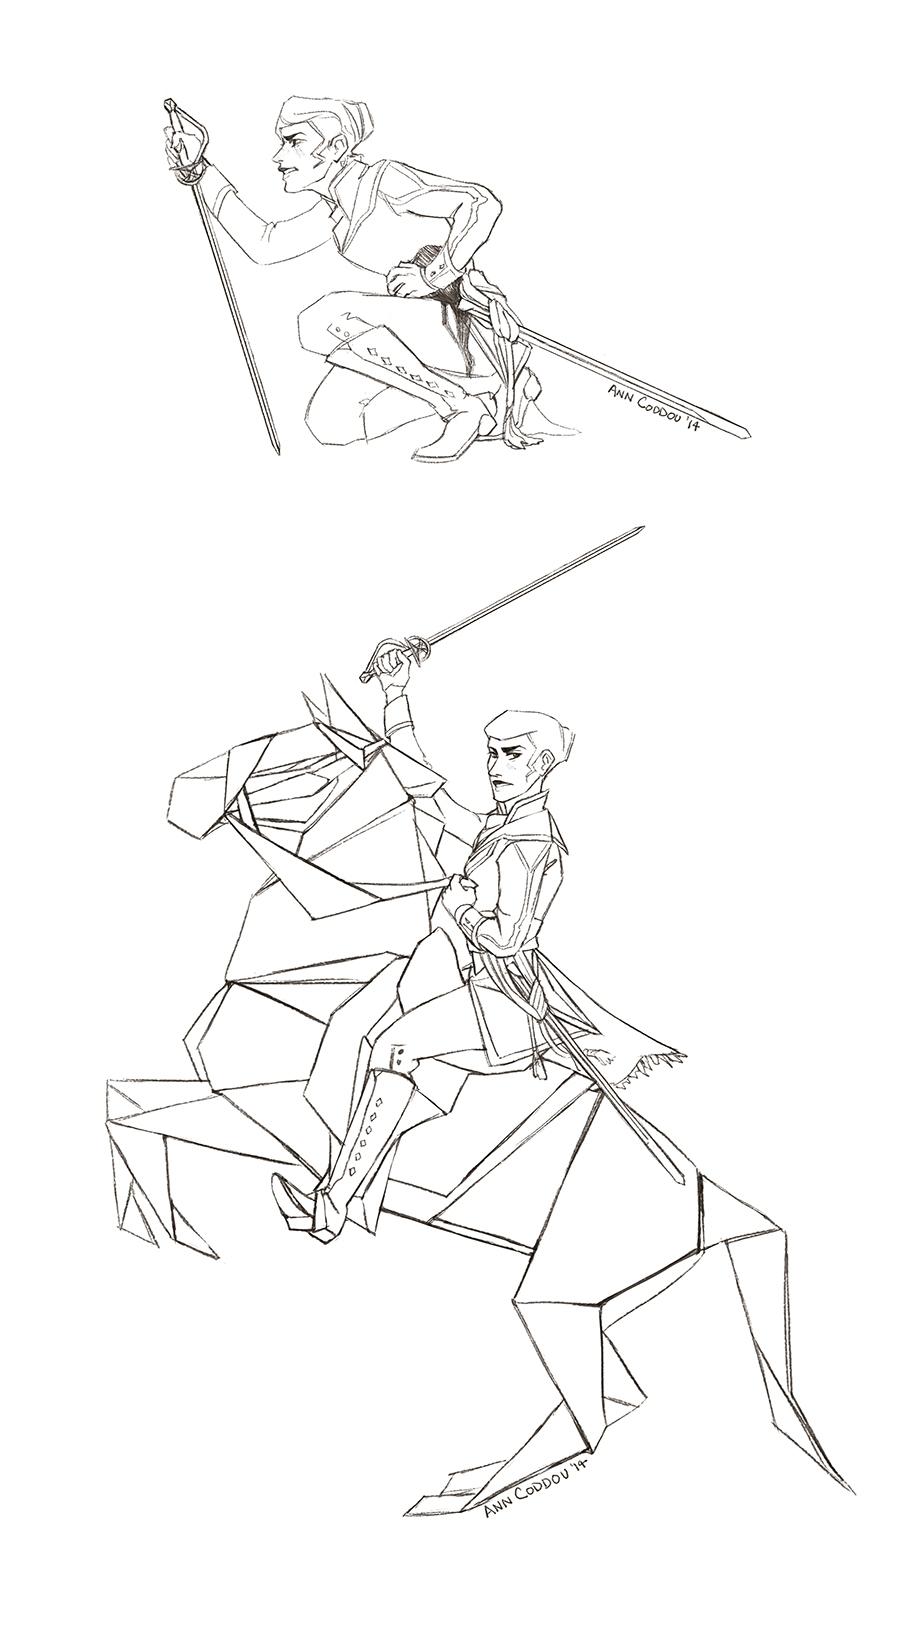 sketches webcomic, Cénit - cenit - anndorphin | ello